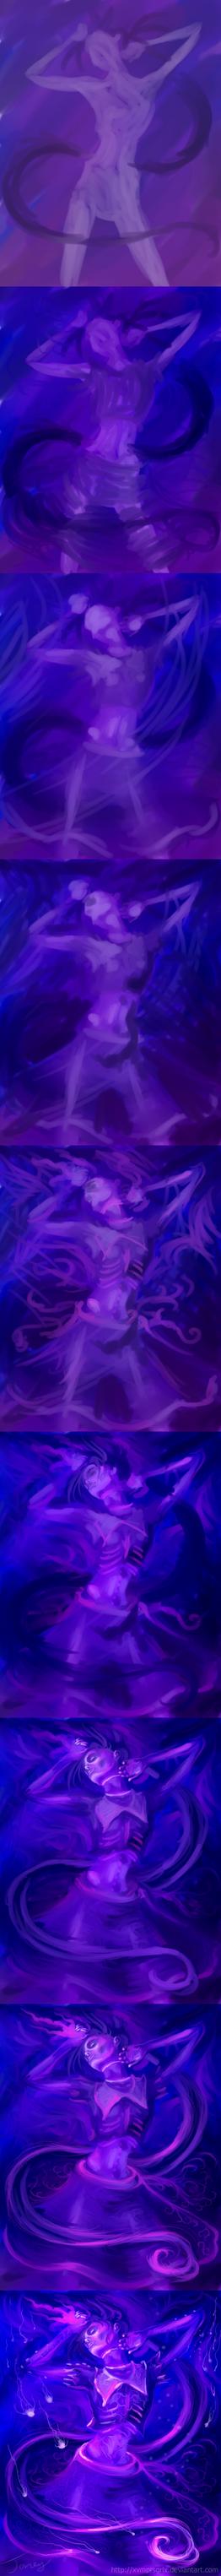 I Dance Within My Magic - Walkthrough by xvmprsgrlx